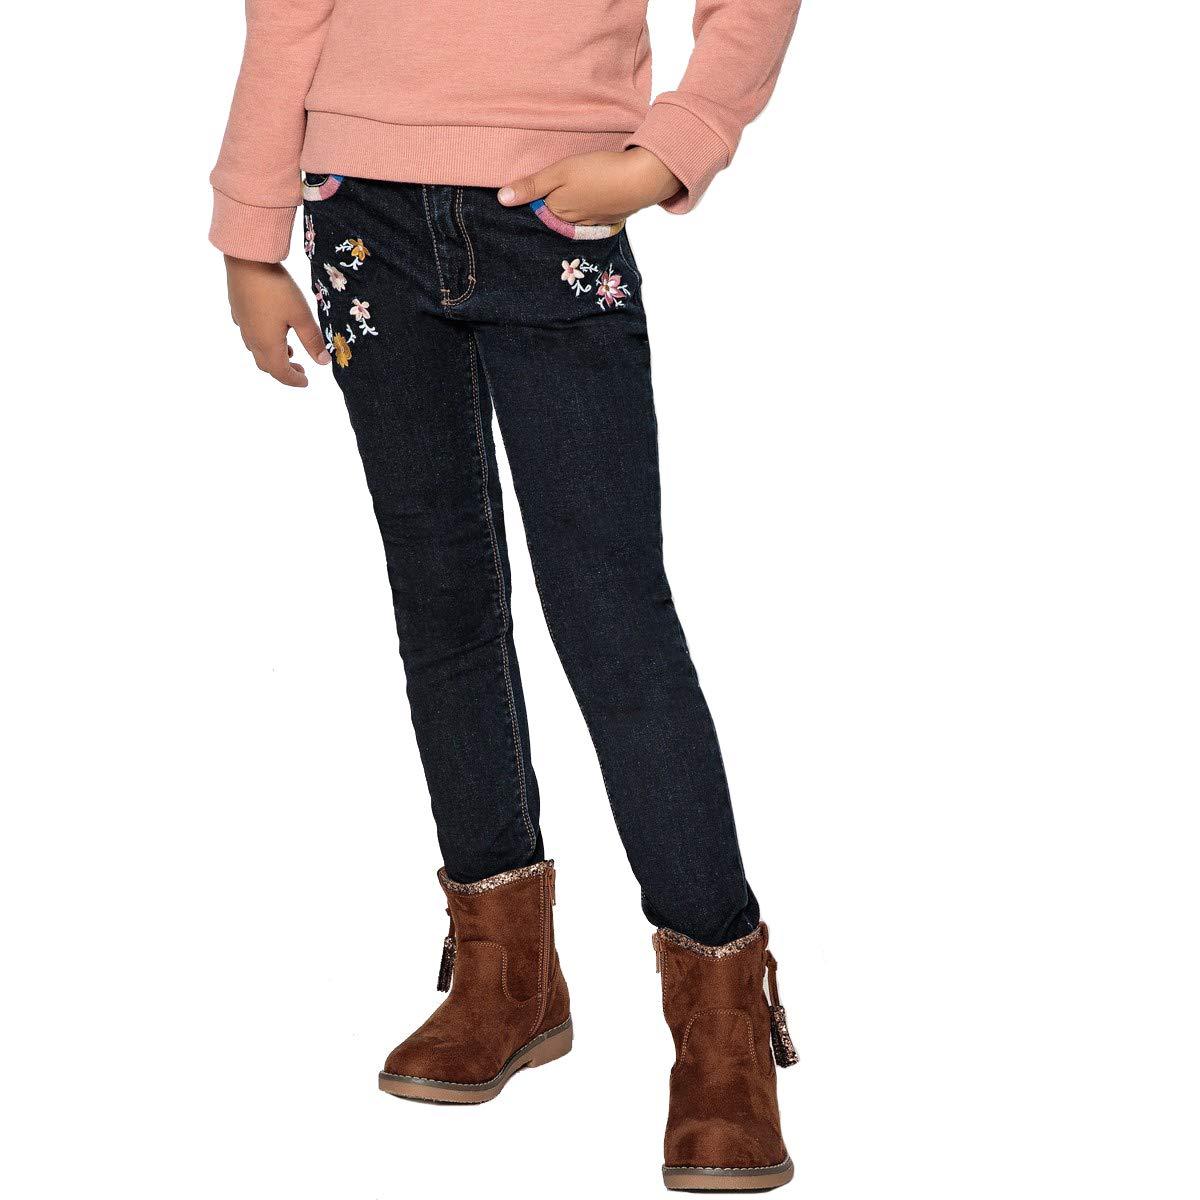 La Redoute Collections Bambina Jeans Skinny Ricamato 3 12 Anni 350114081